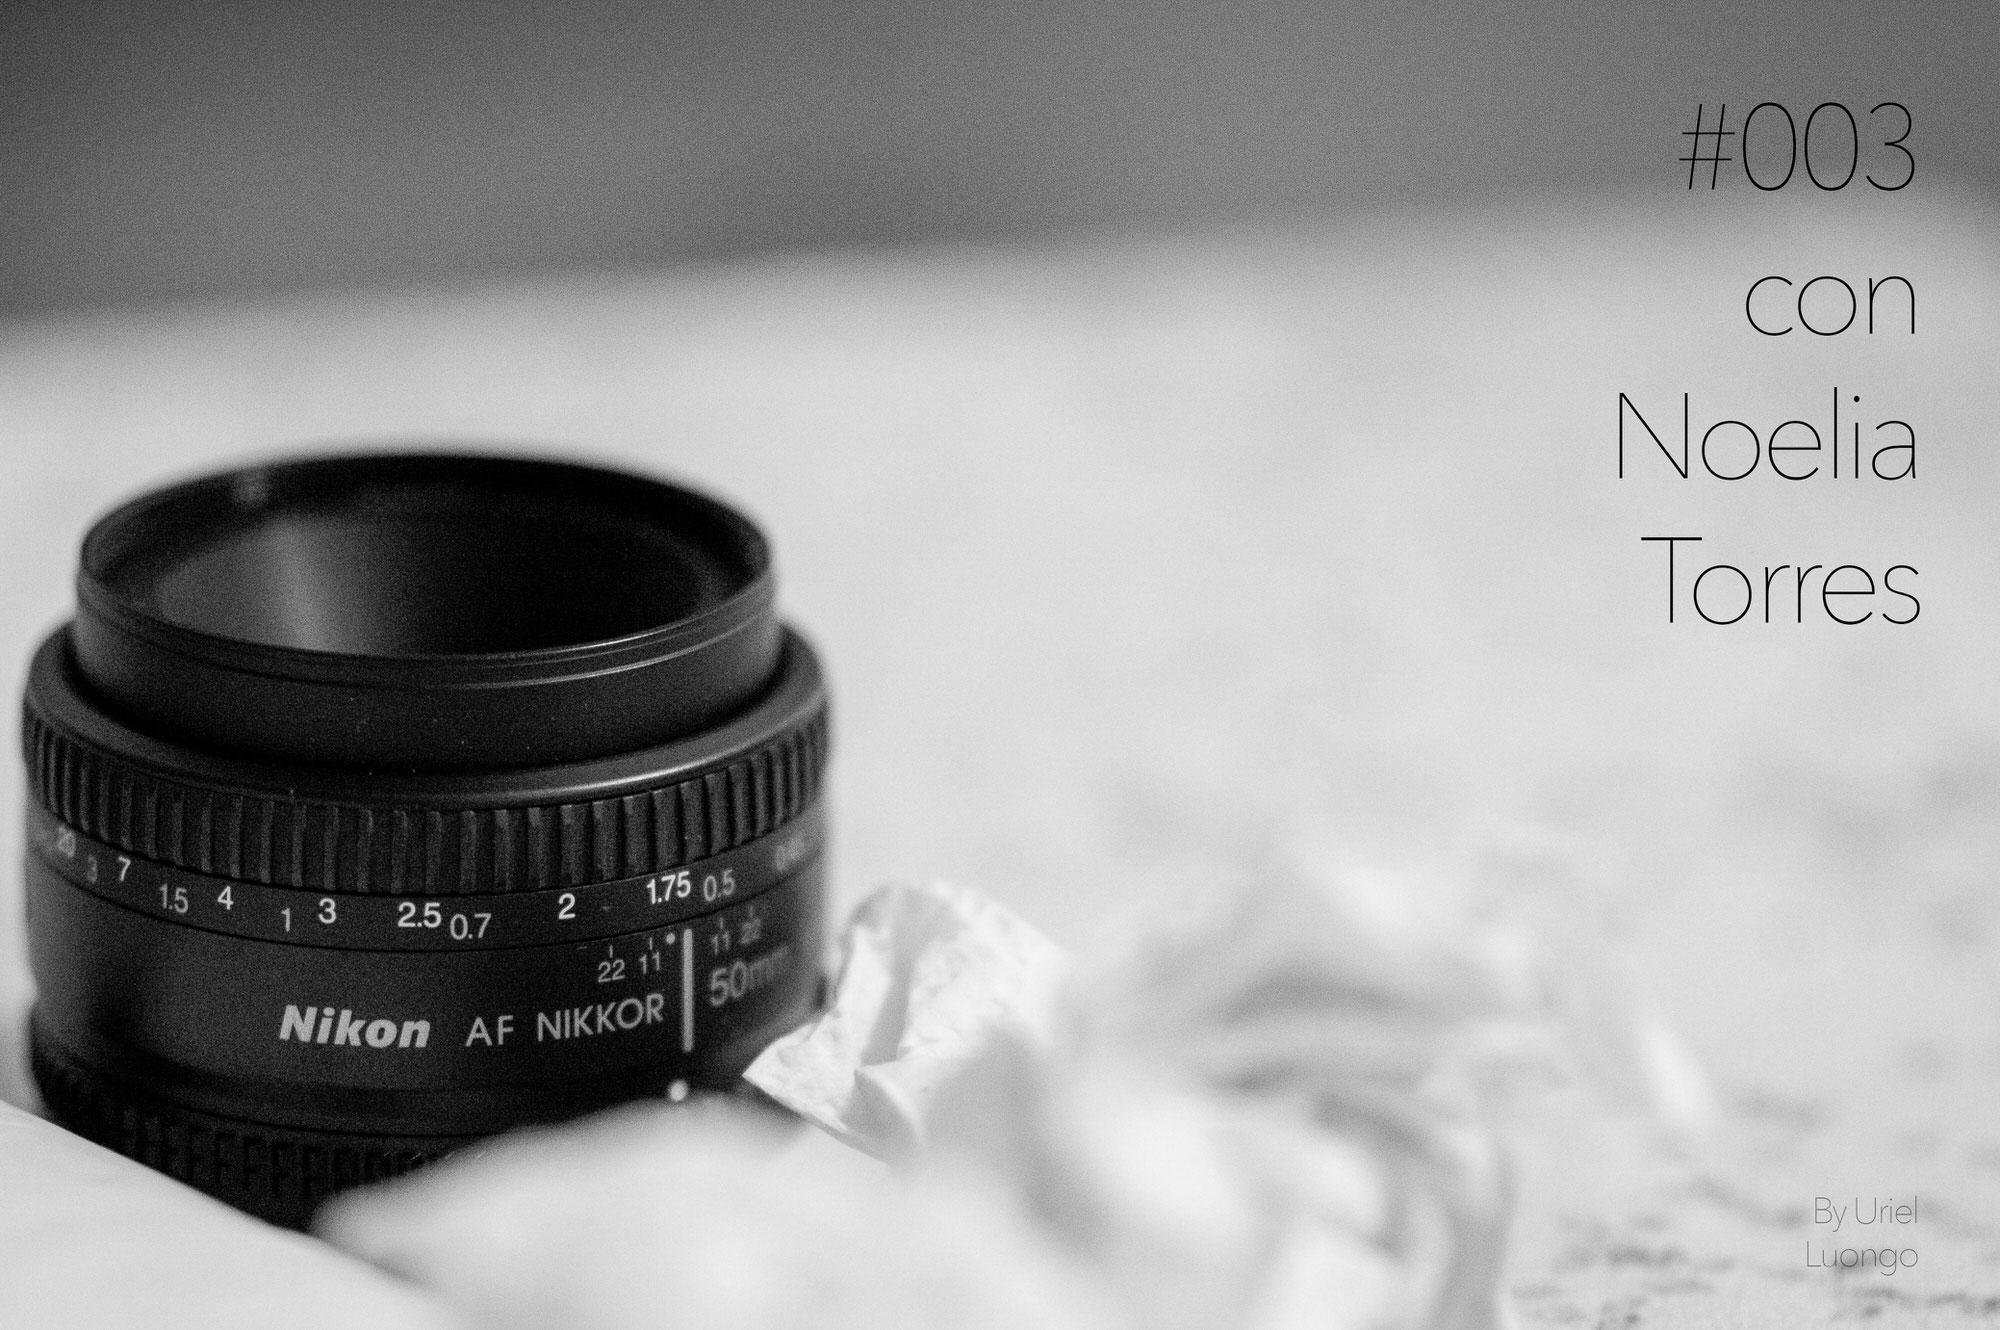 noelia-torres-podcast-urielluongo-charla-de-fotografos